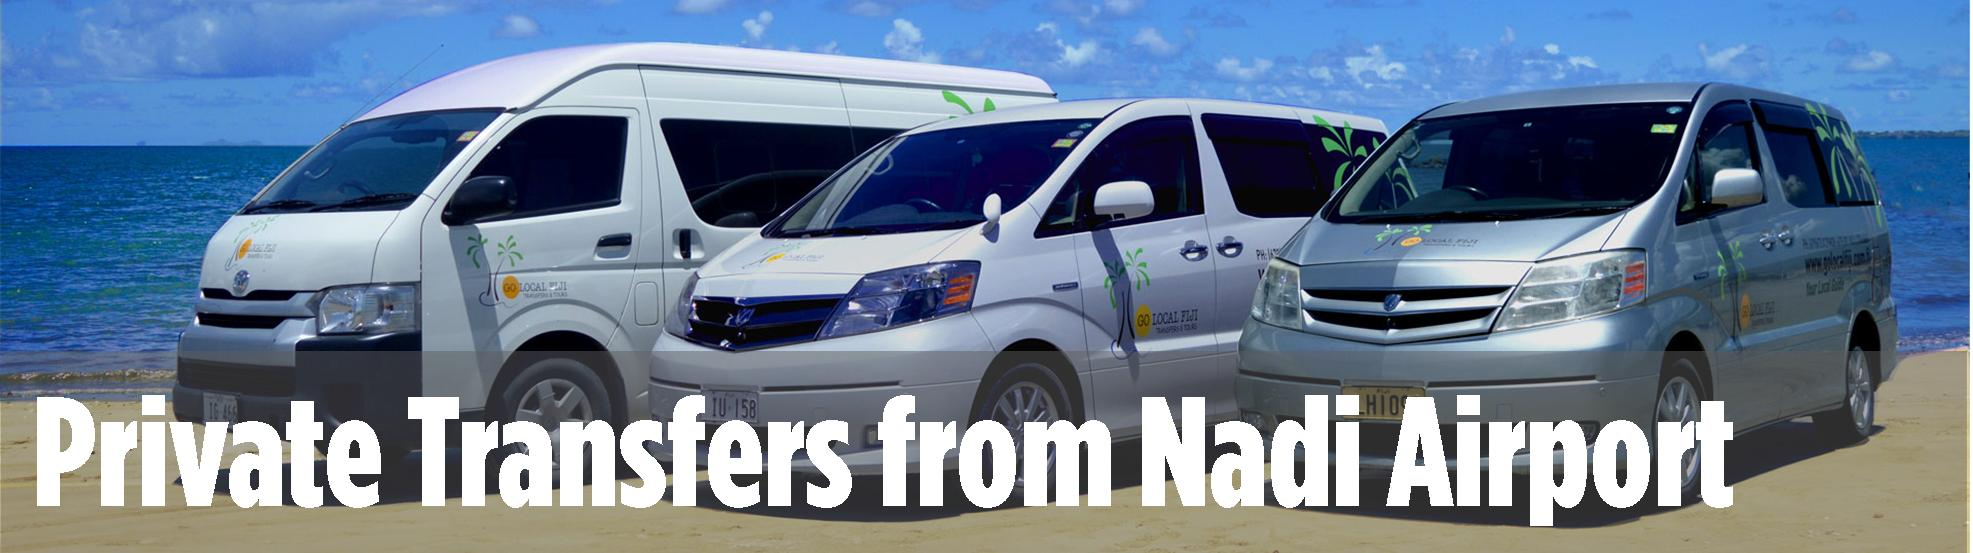 Private Airport Transfers in Fiji